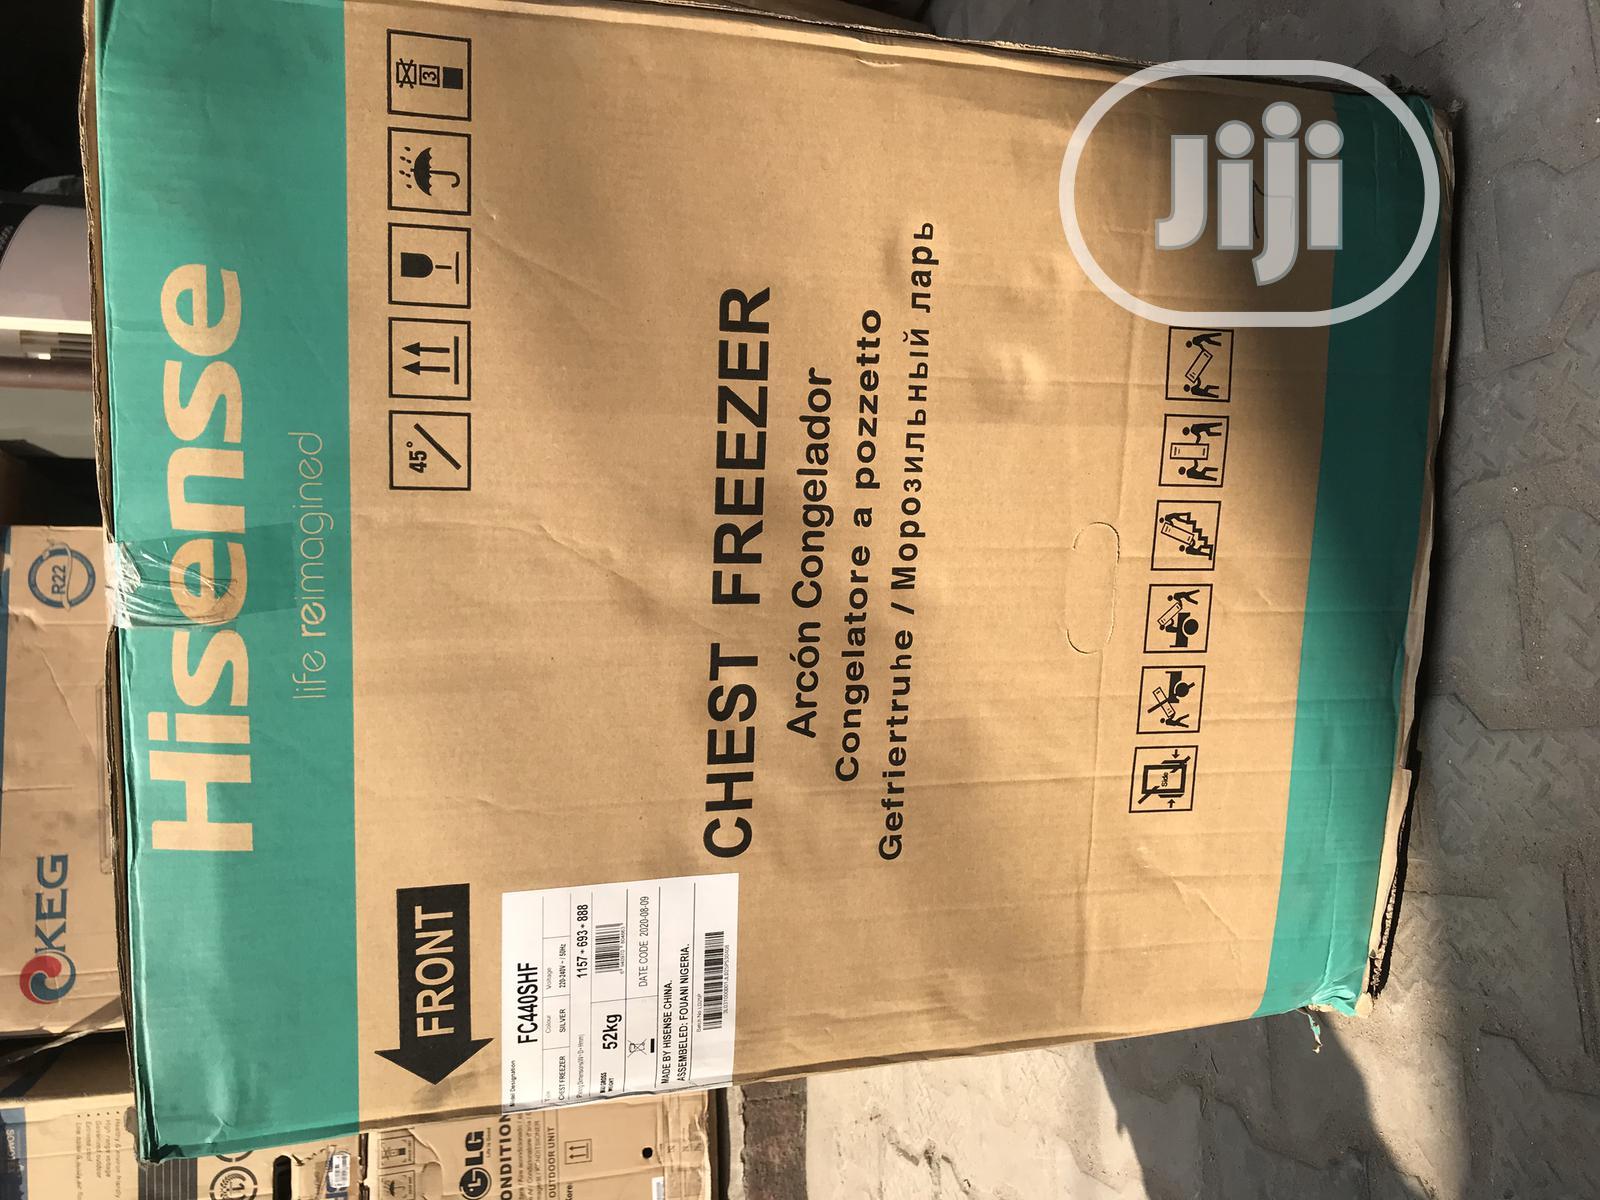 Hisense Chest Freezer 440 310 Liters | Kitchen Appliances for sale in Ajah, Lagos State, Nigeria